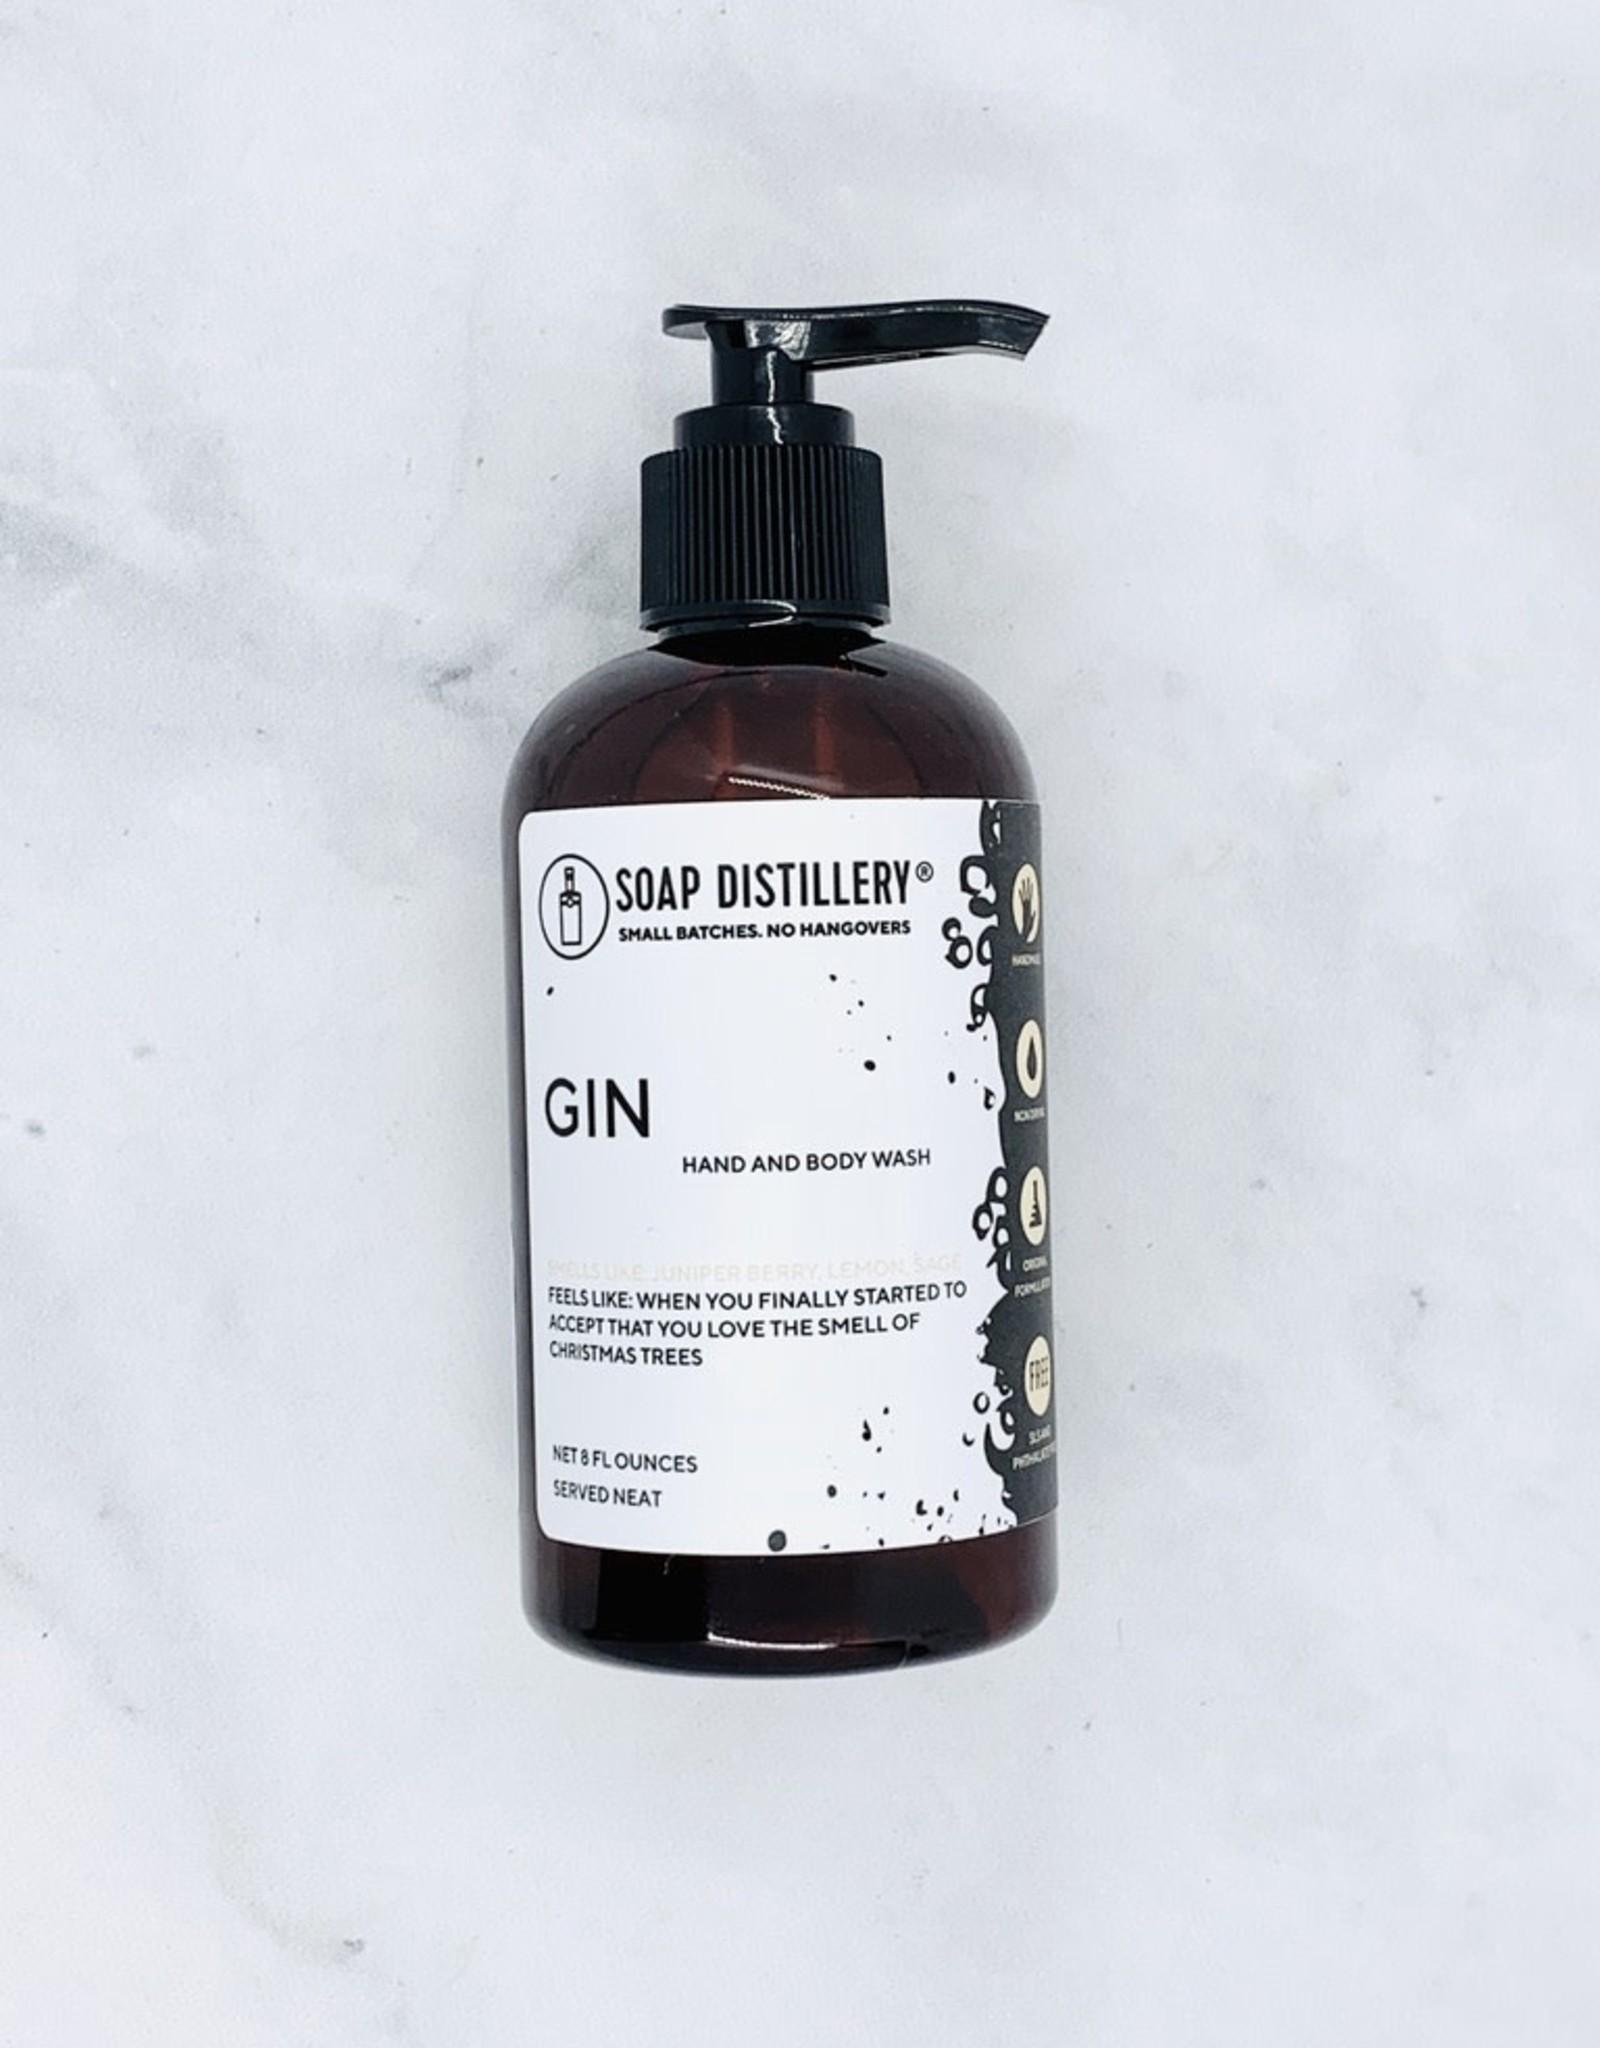 Gin Hand and Body Wash